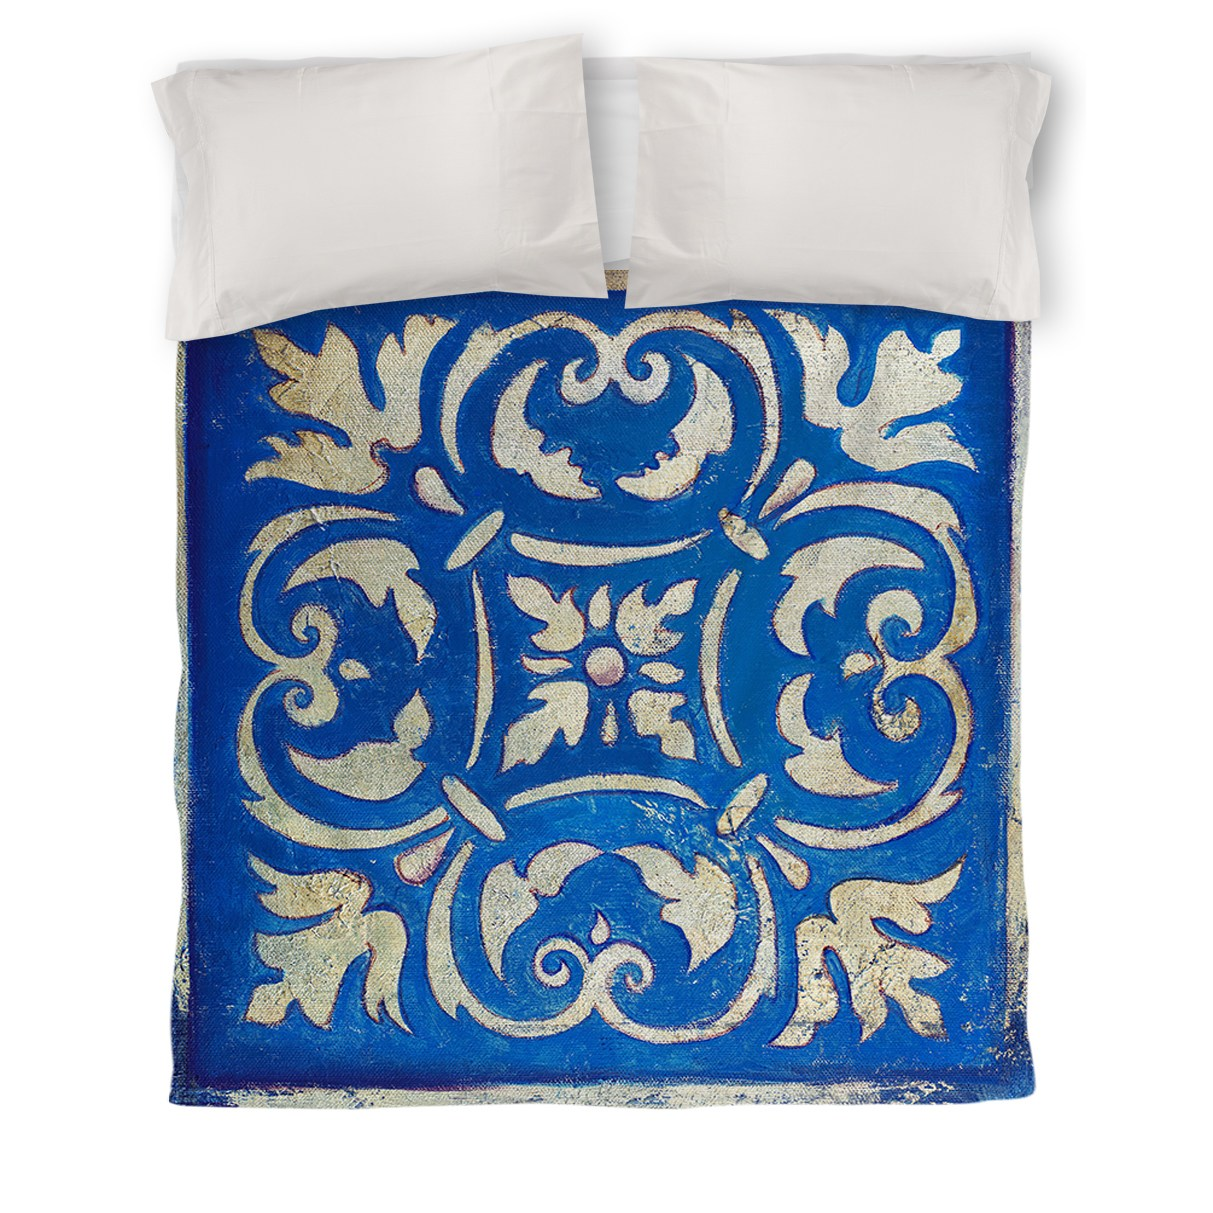 IDG Blue Mosaic Duvet Cover